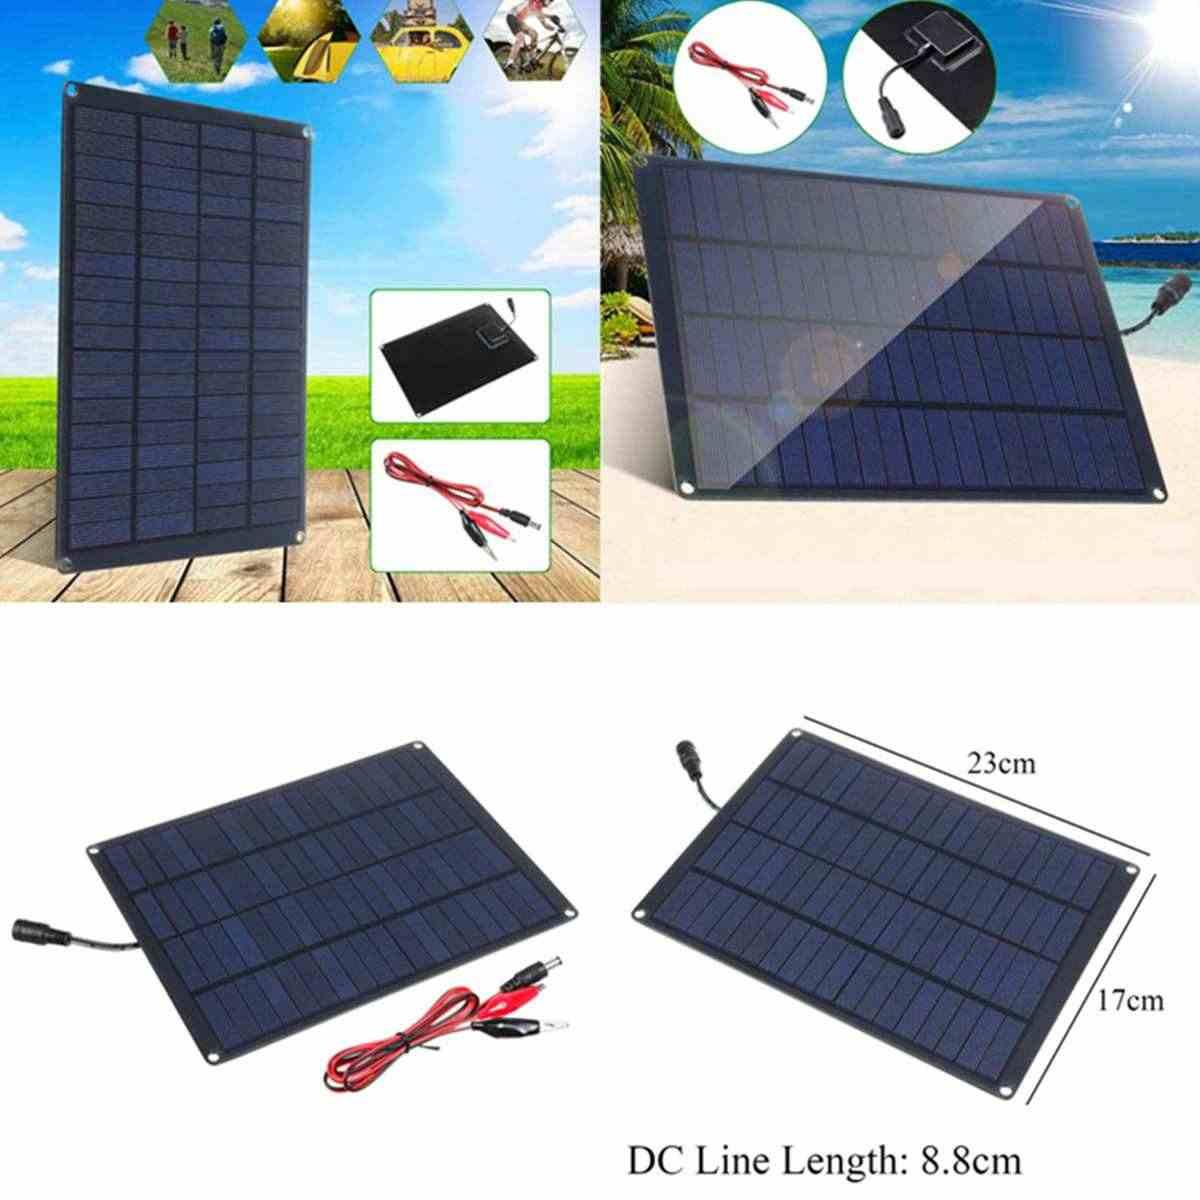 10W 12V 18V لوحة طاقة شمسية للماء عالية الكفاءة الخلايا الشمسية المحمولة للتخييم في الهواء الطلق المشي سيارة الهاتف شاحن بالطاقة الشمسية